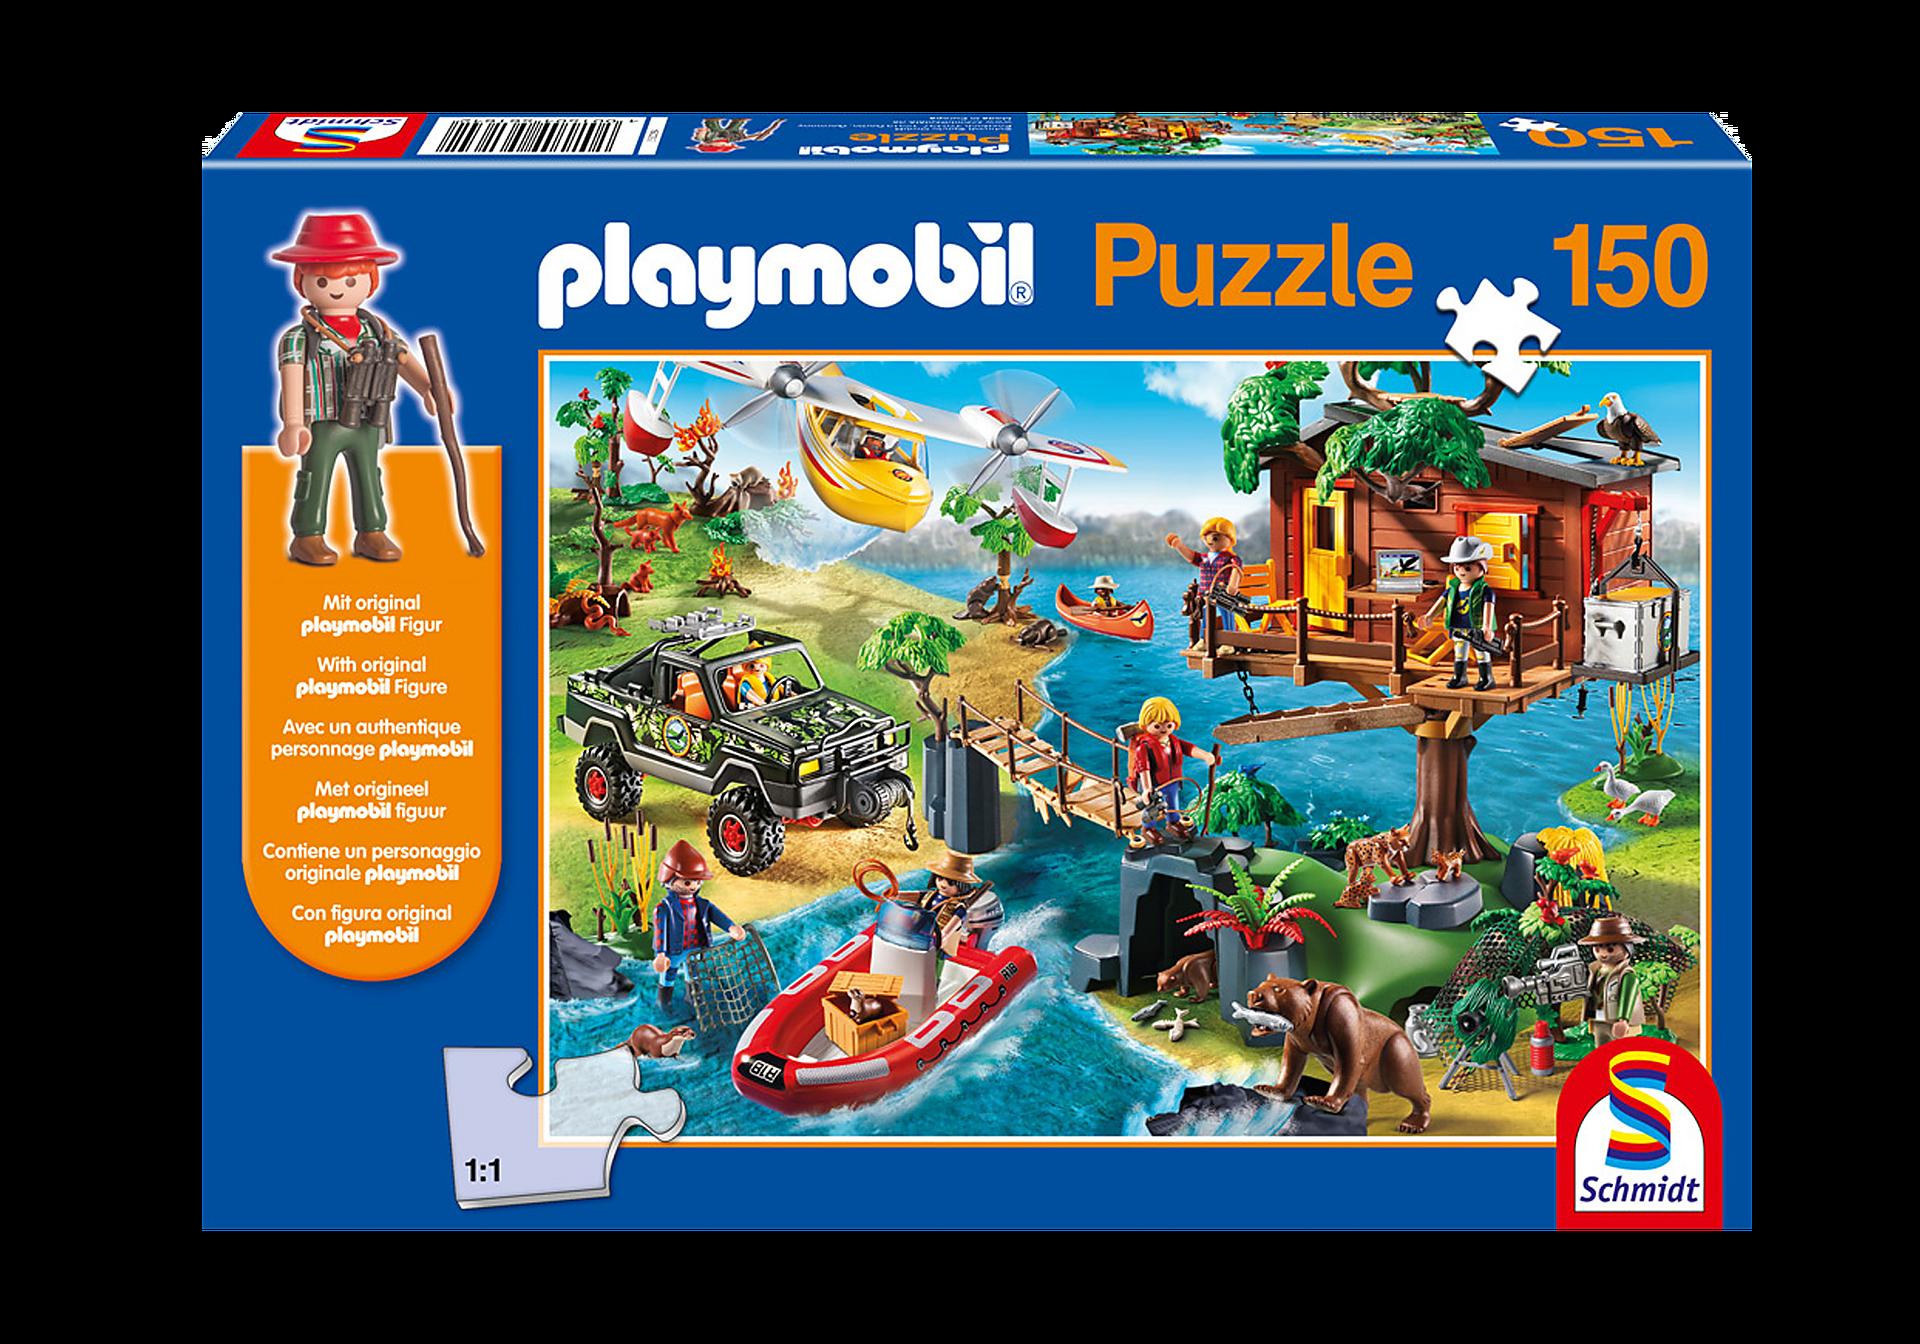 http://media.playmobil.com/i/playmobil/80010_product_detail/Puzzle - Abenteuer-Baumhaus